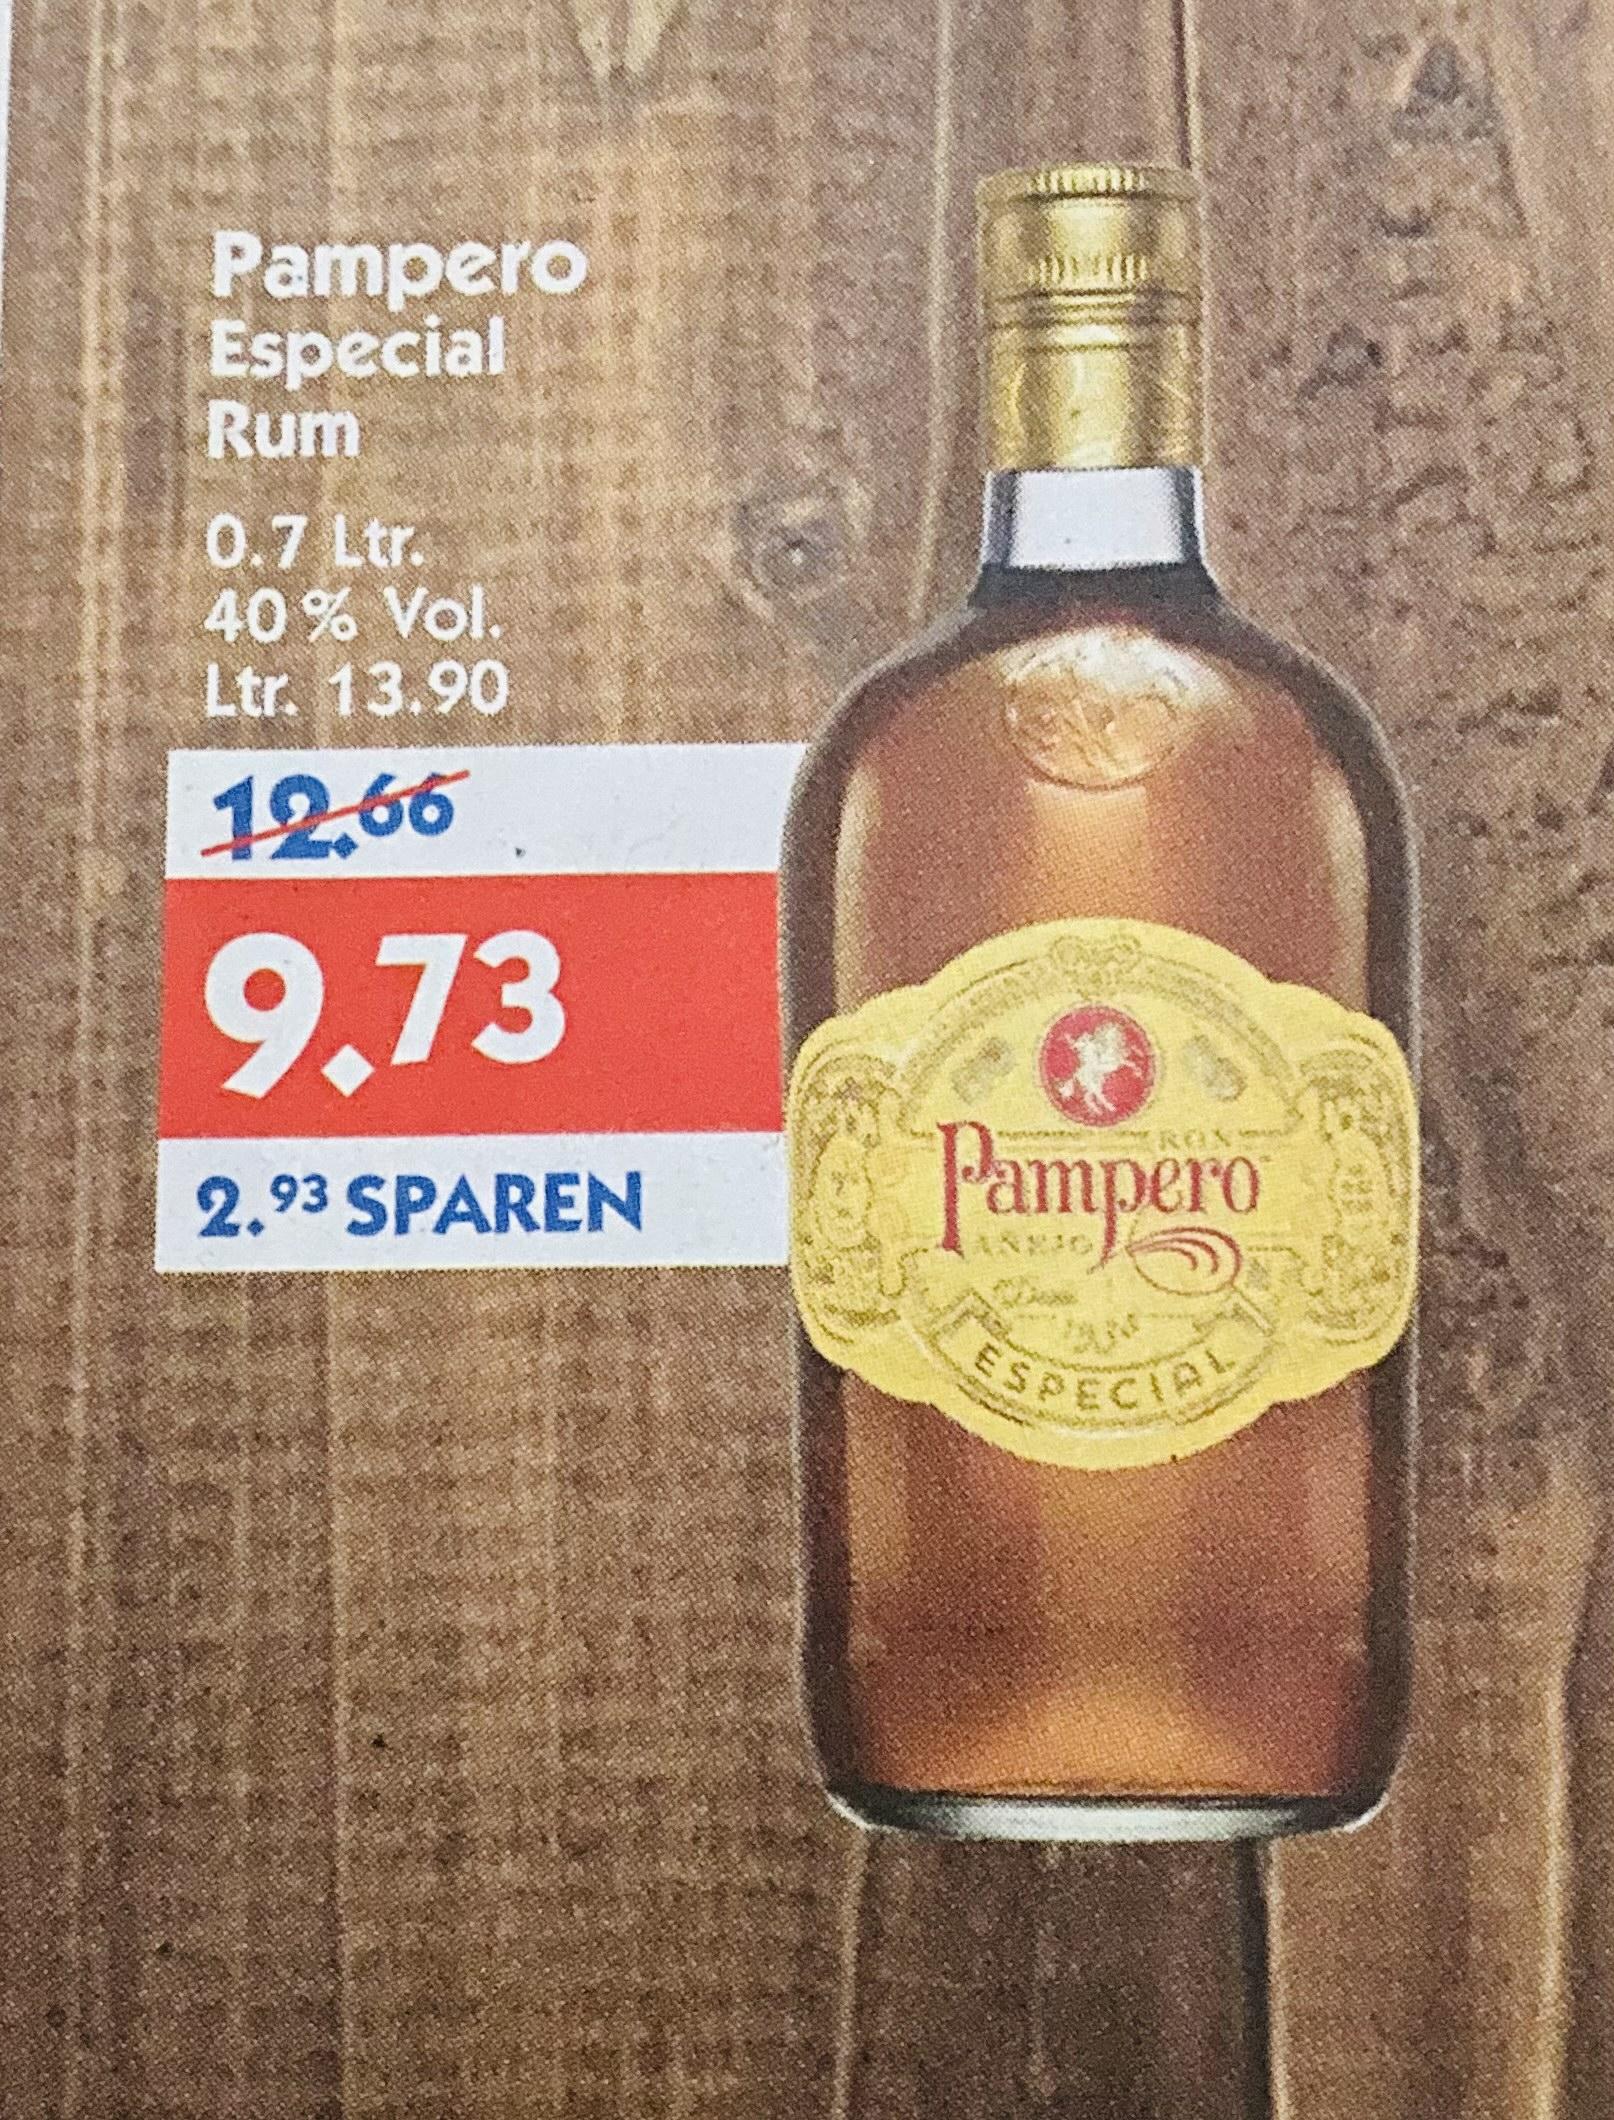 LOKAL: Hol' Ab: Pampero Añejo Especial Rum